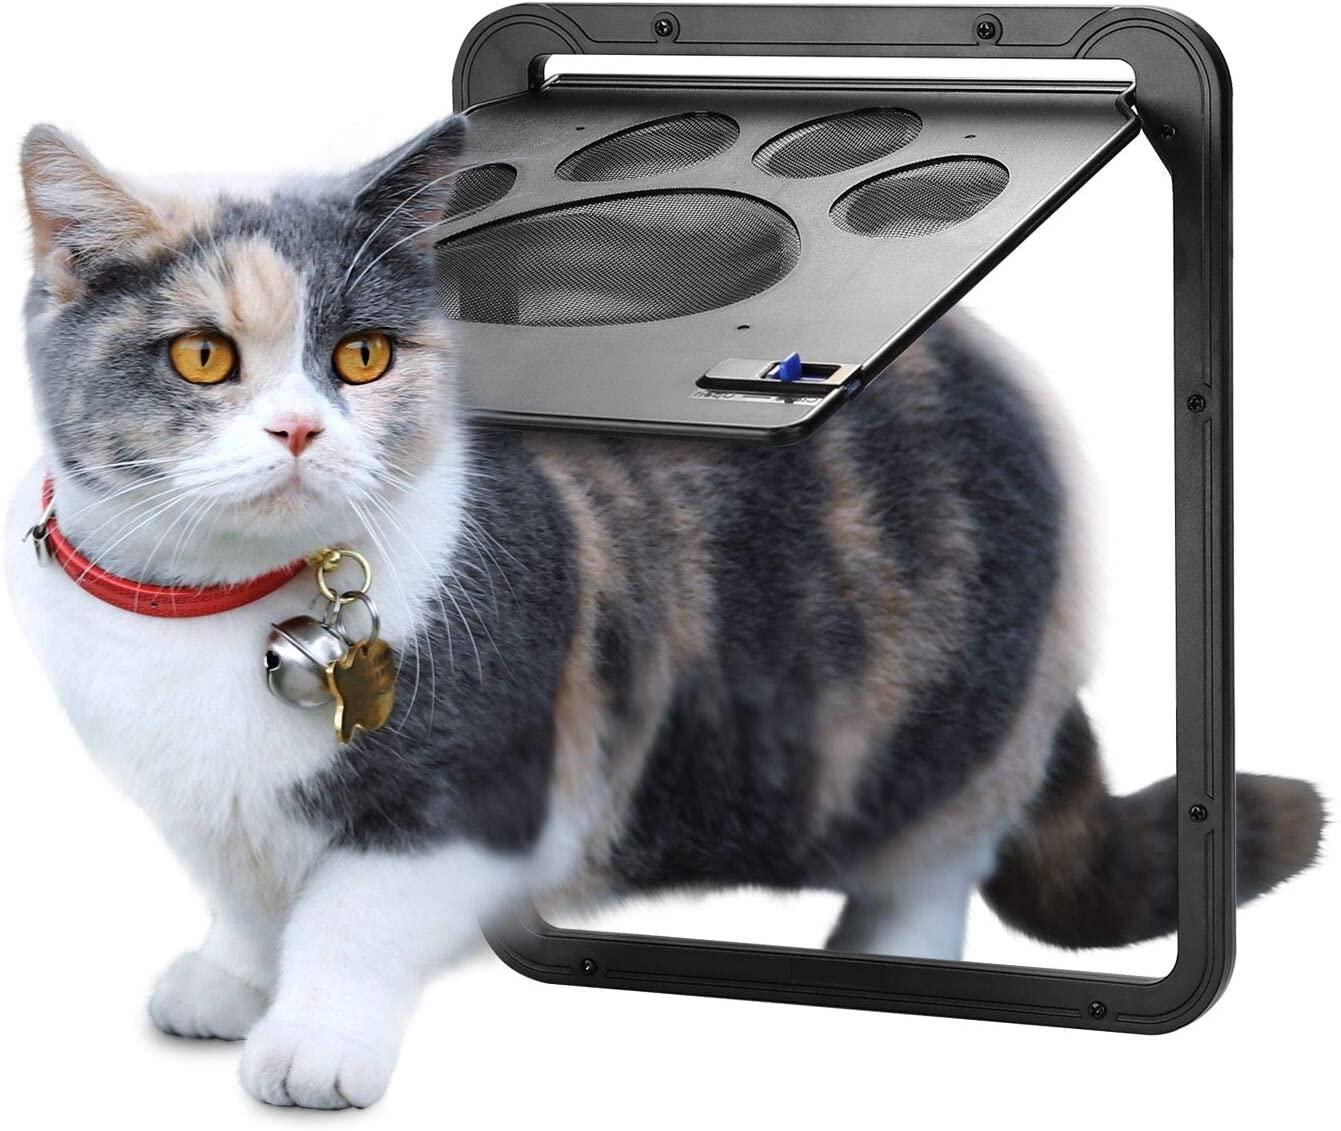 Ownpets ランキングTOP10 ペットドア 網戸専用 網戸用ペットの出入り口 OWNPETS 取付簡単 猫 挿し込む式ドア グレー 完全送料無料 ペット出入り口 ロック付き 24cm×29cm 磁石設計 小型犬用